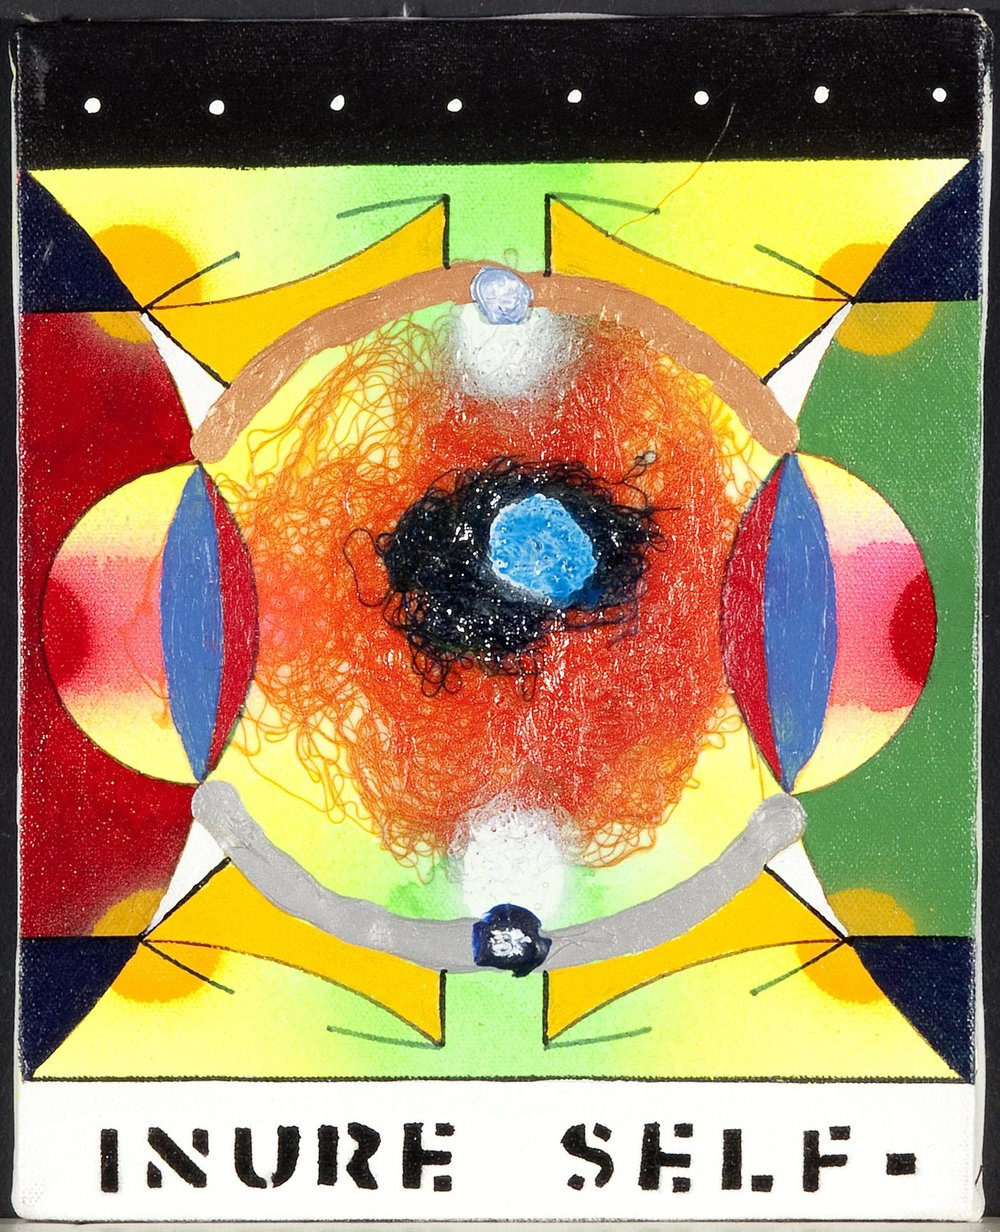 Innure Self, 1984